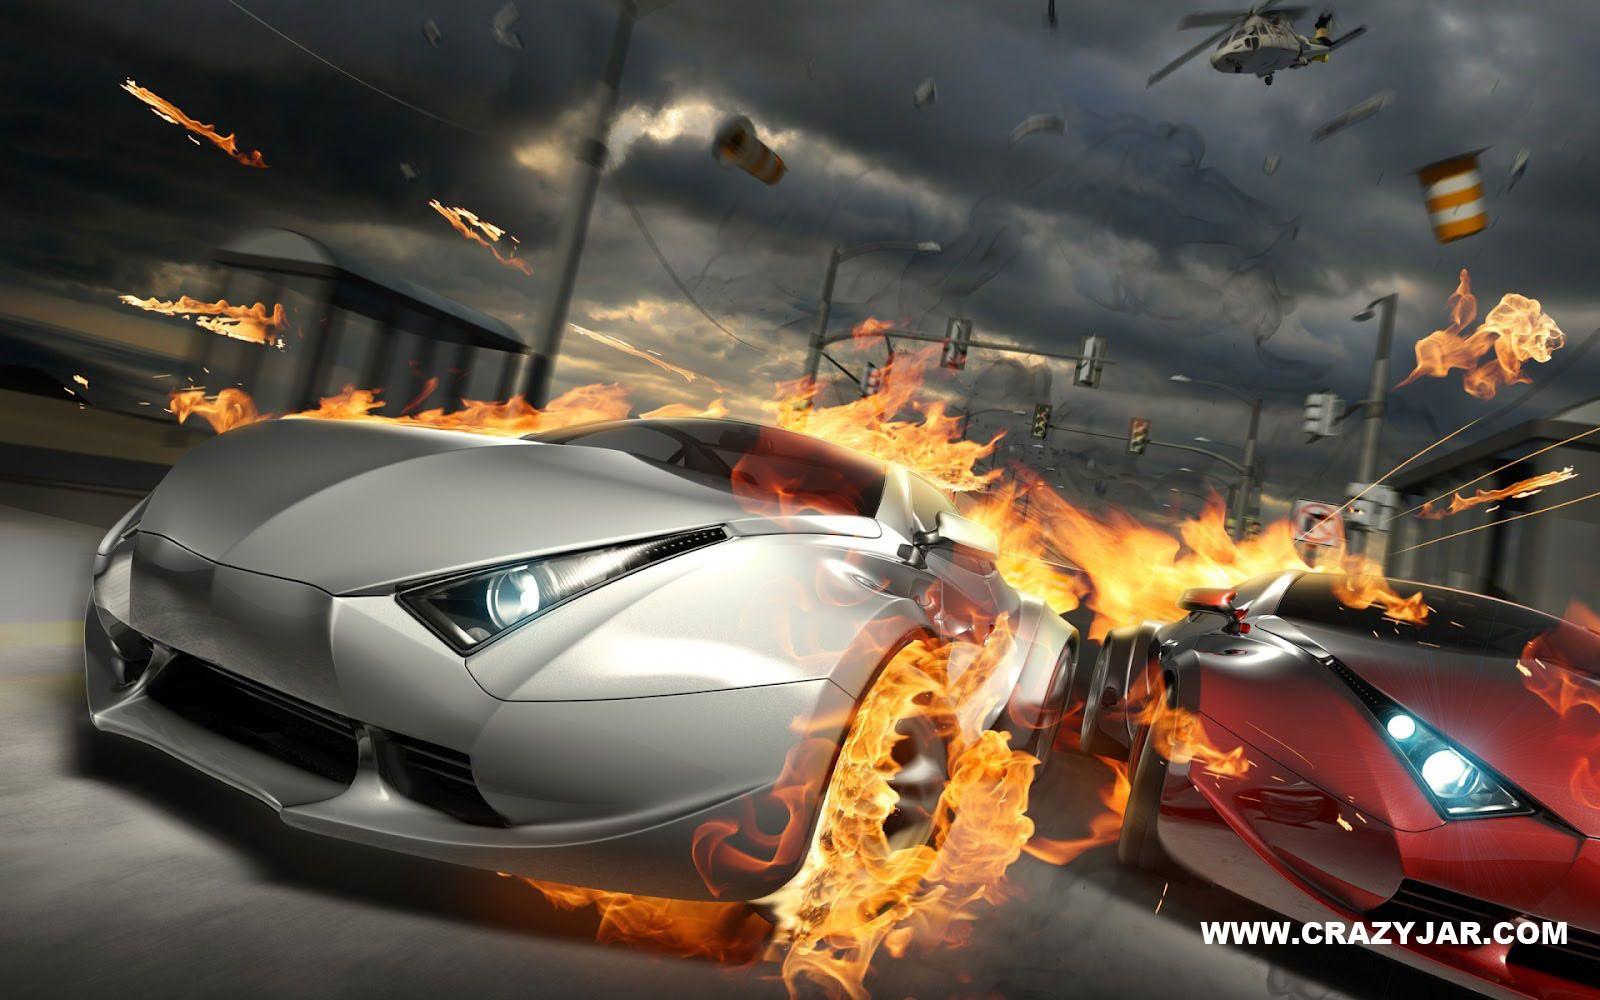 Asphalt 9 Legends Gameloft S Arcade Racing Game Asphalt 9 Legends Has Finally Announced For Mobile Devices It S C Cool Car Backgrounds Car Backgrounds Car